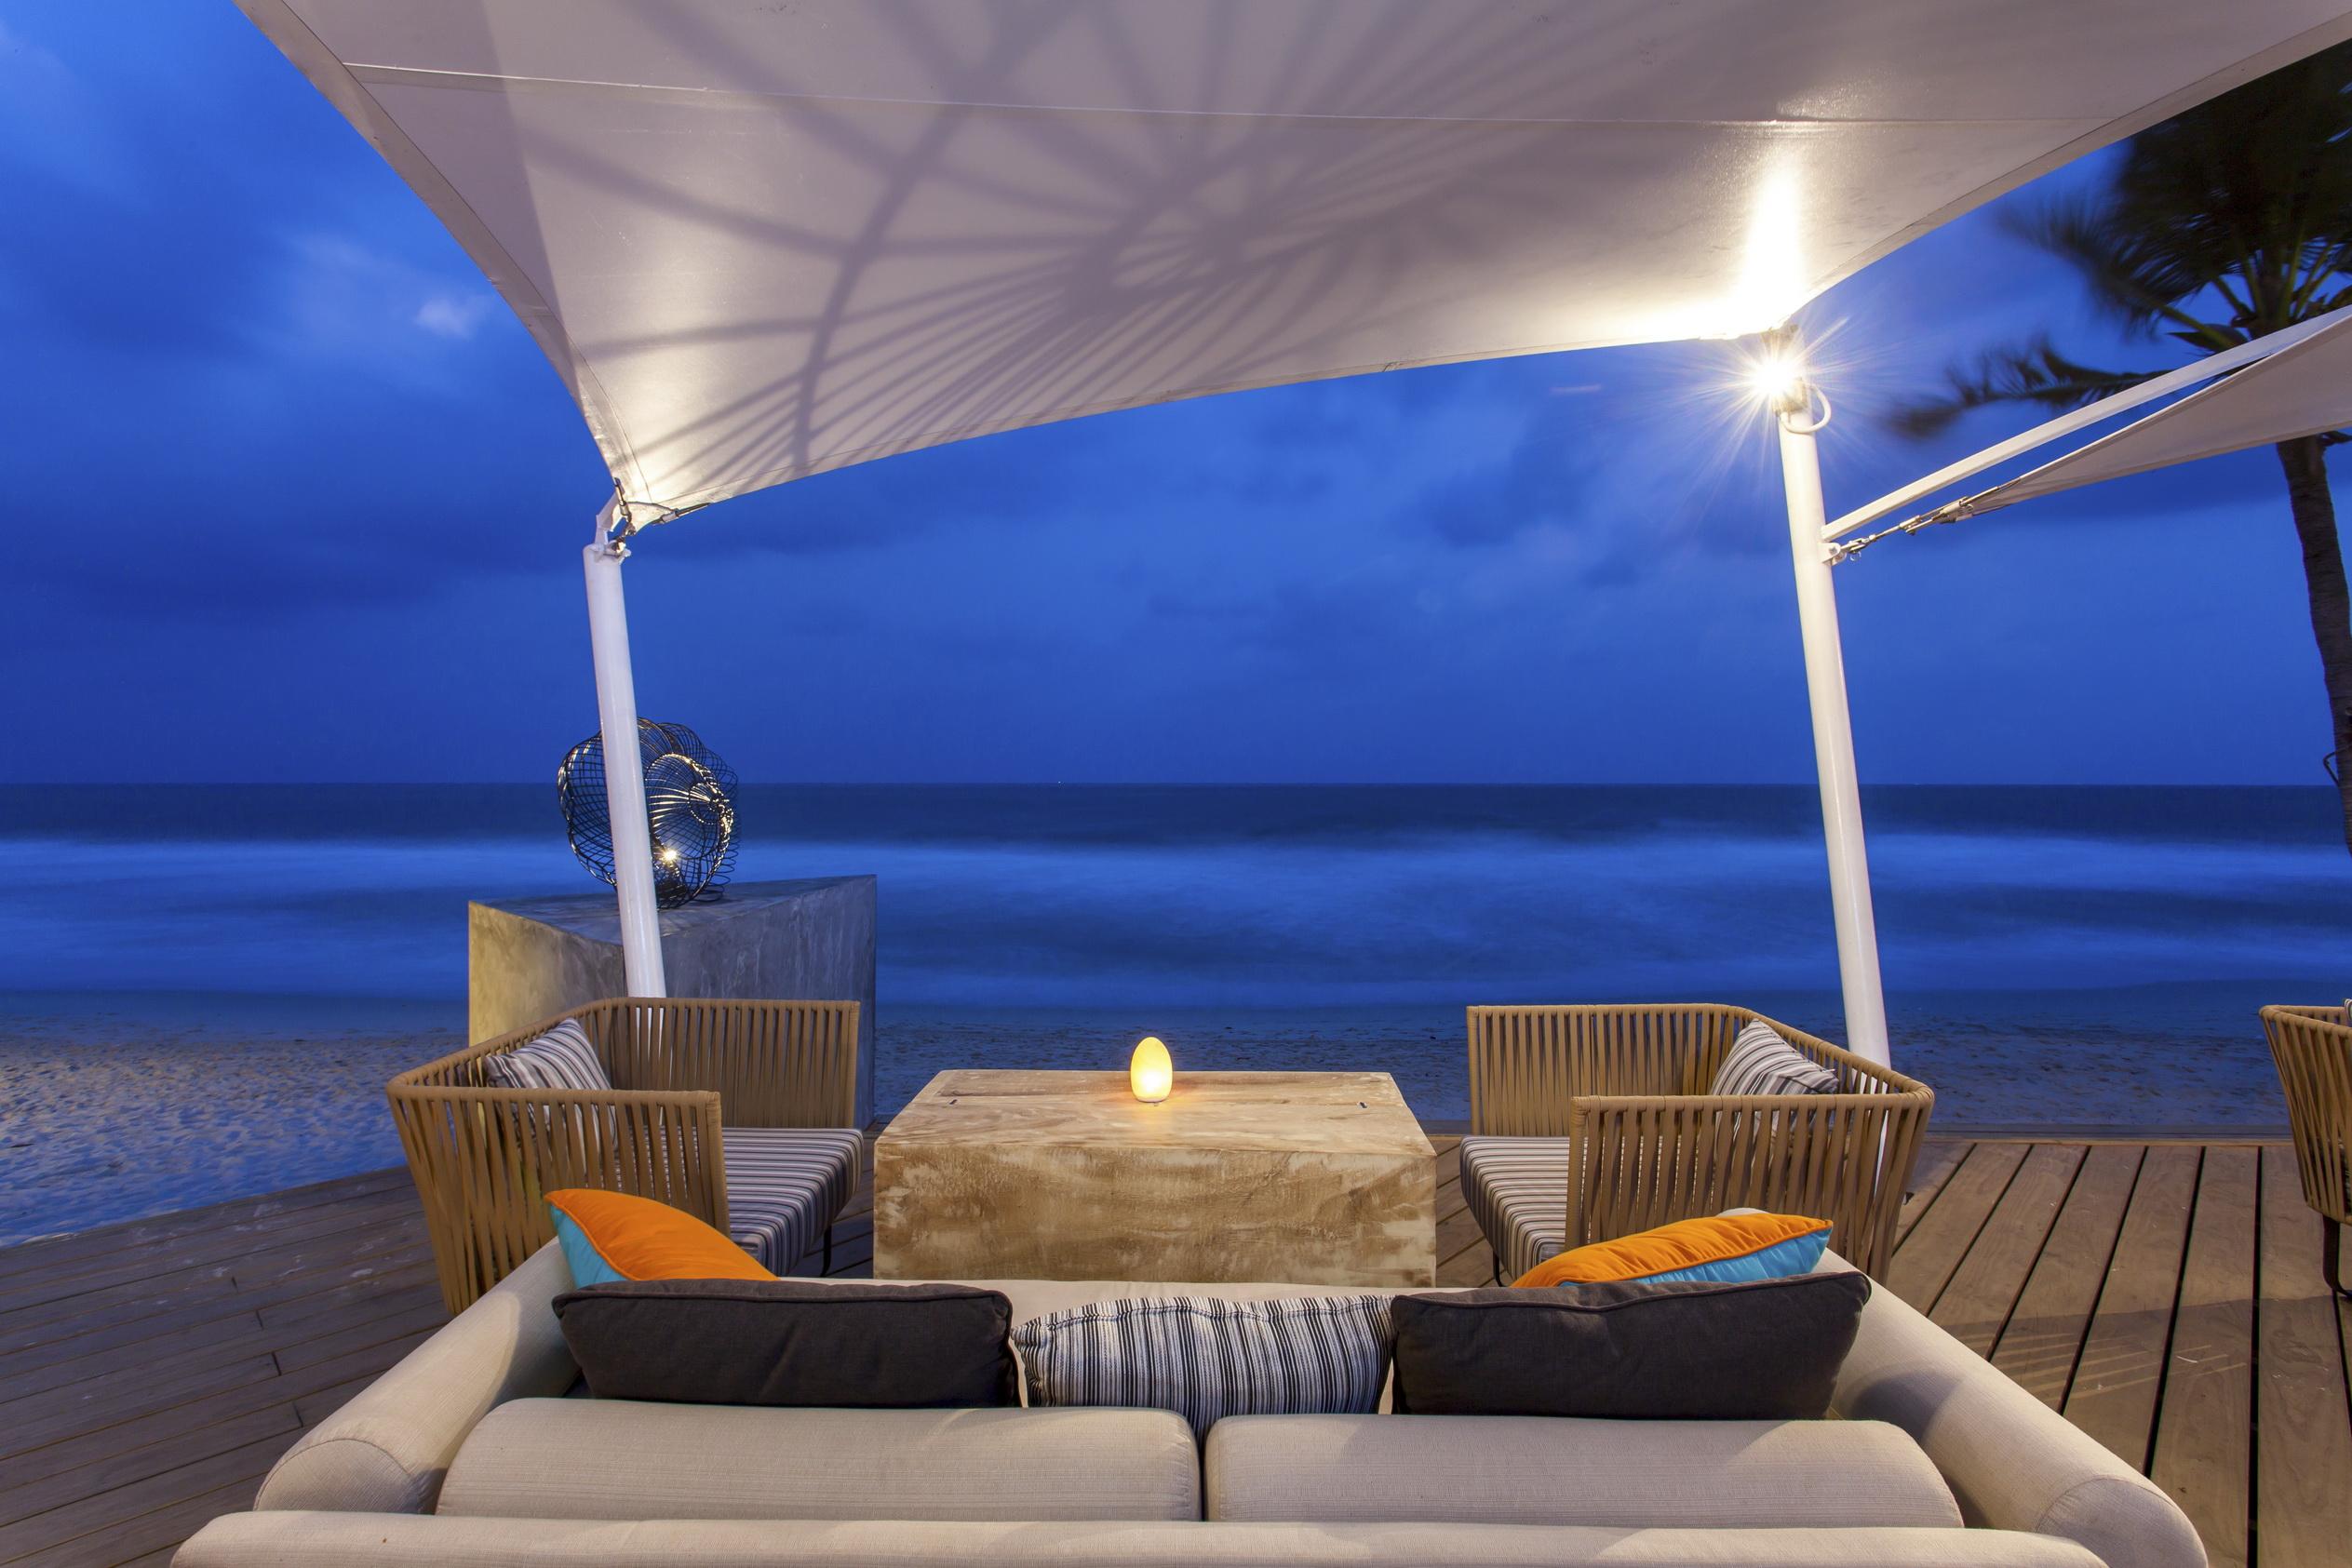 Centara Grand Beach Resort Samui - Evening